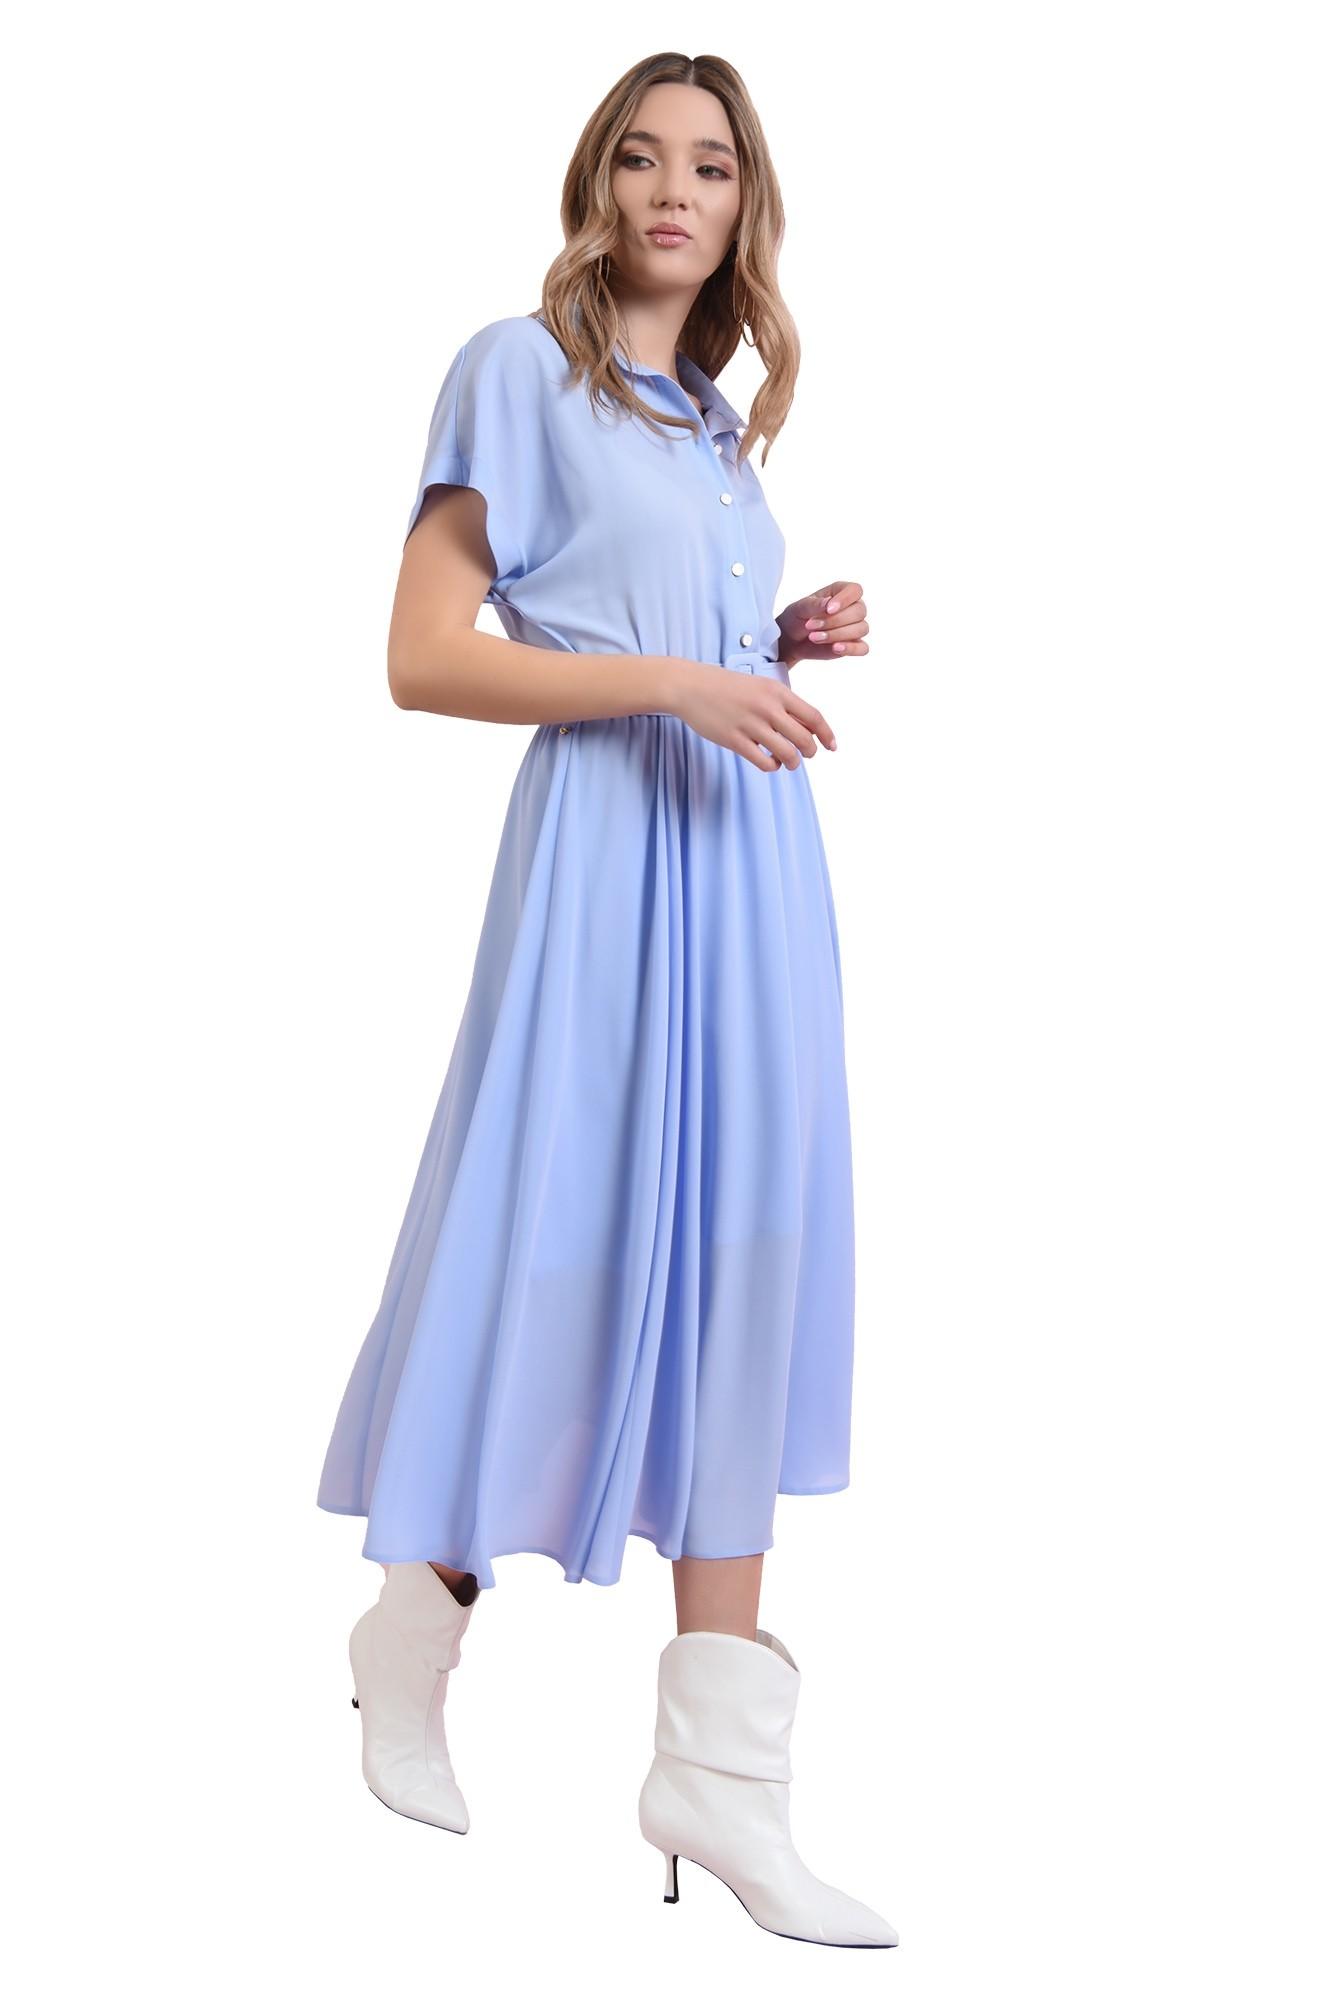 360 - rochie midi, bleu, 3/4, maneci raglan, centura